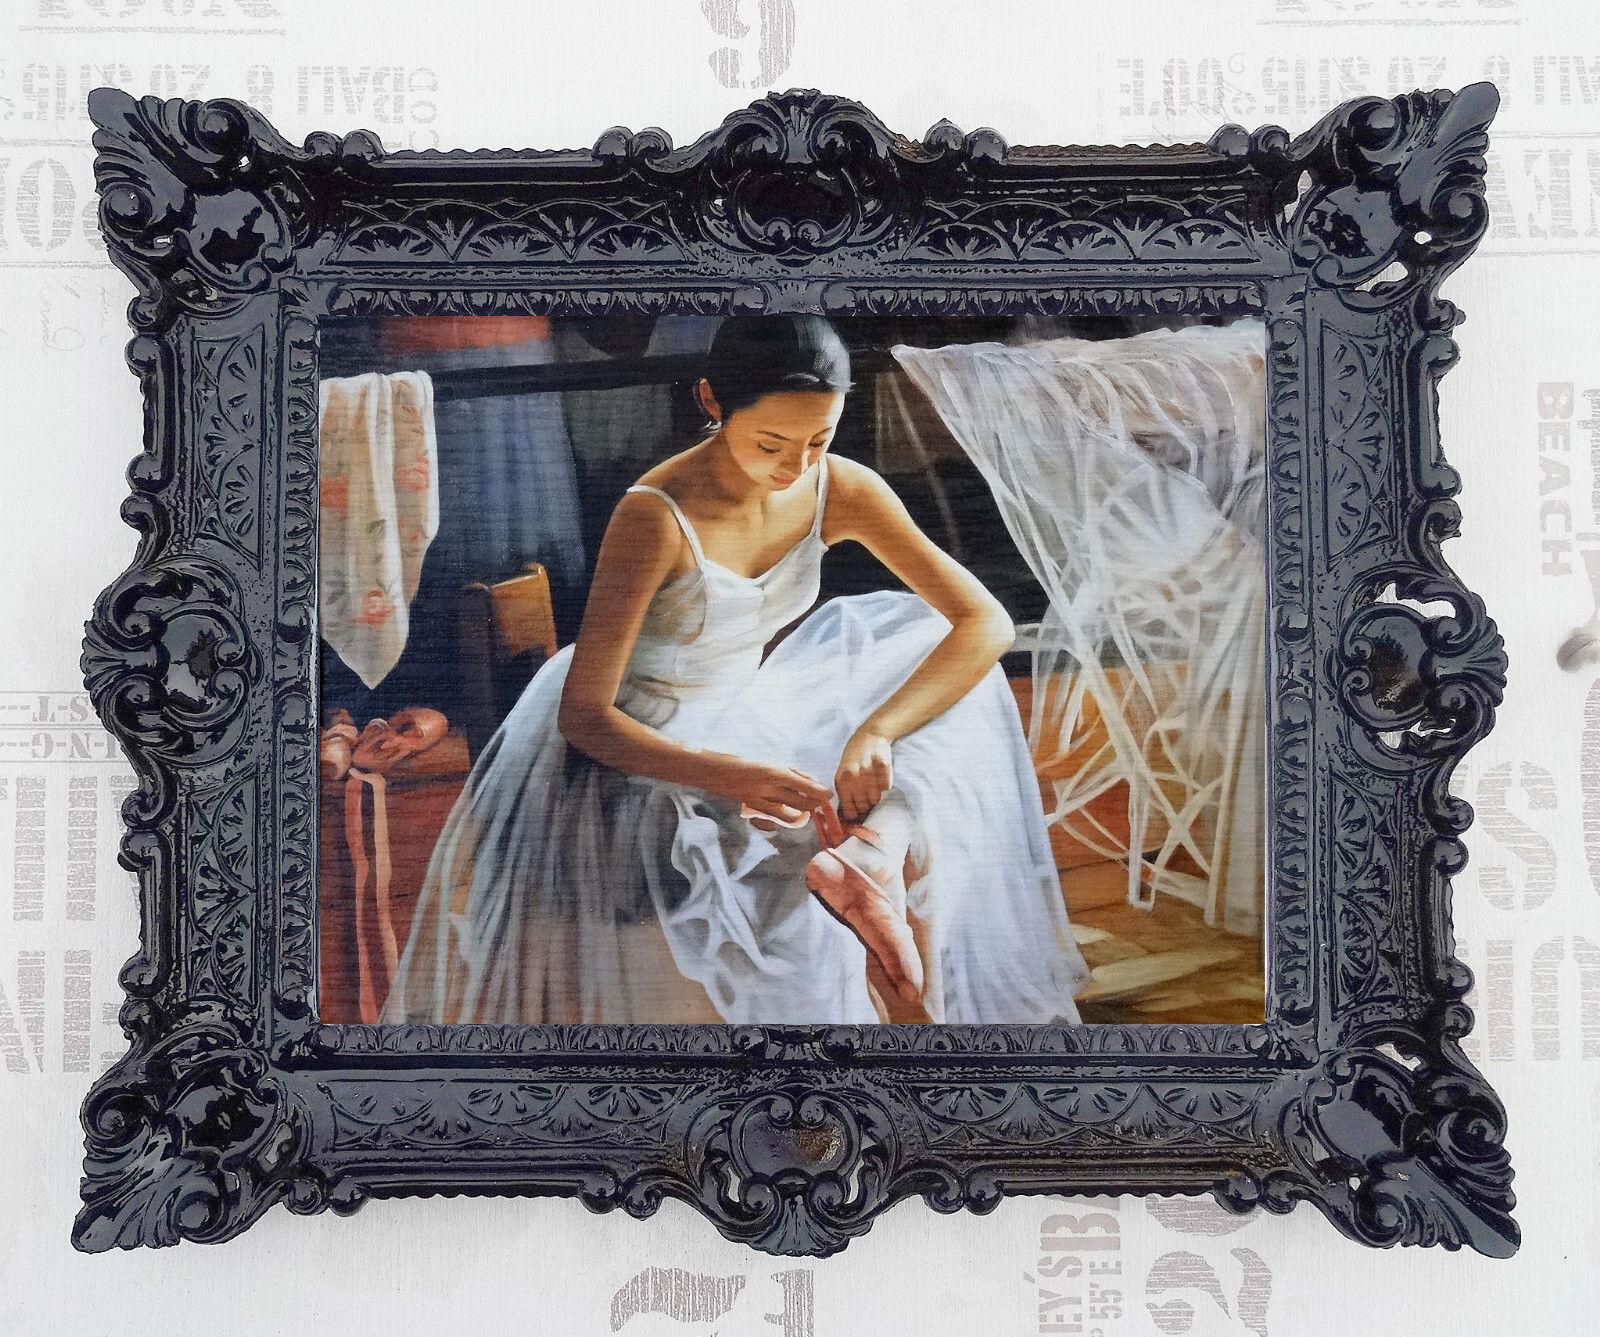 Gemälde Bilder Barock Antik Repro Ballerina Ballett Kunstwerke 56x46 cm in Gold